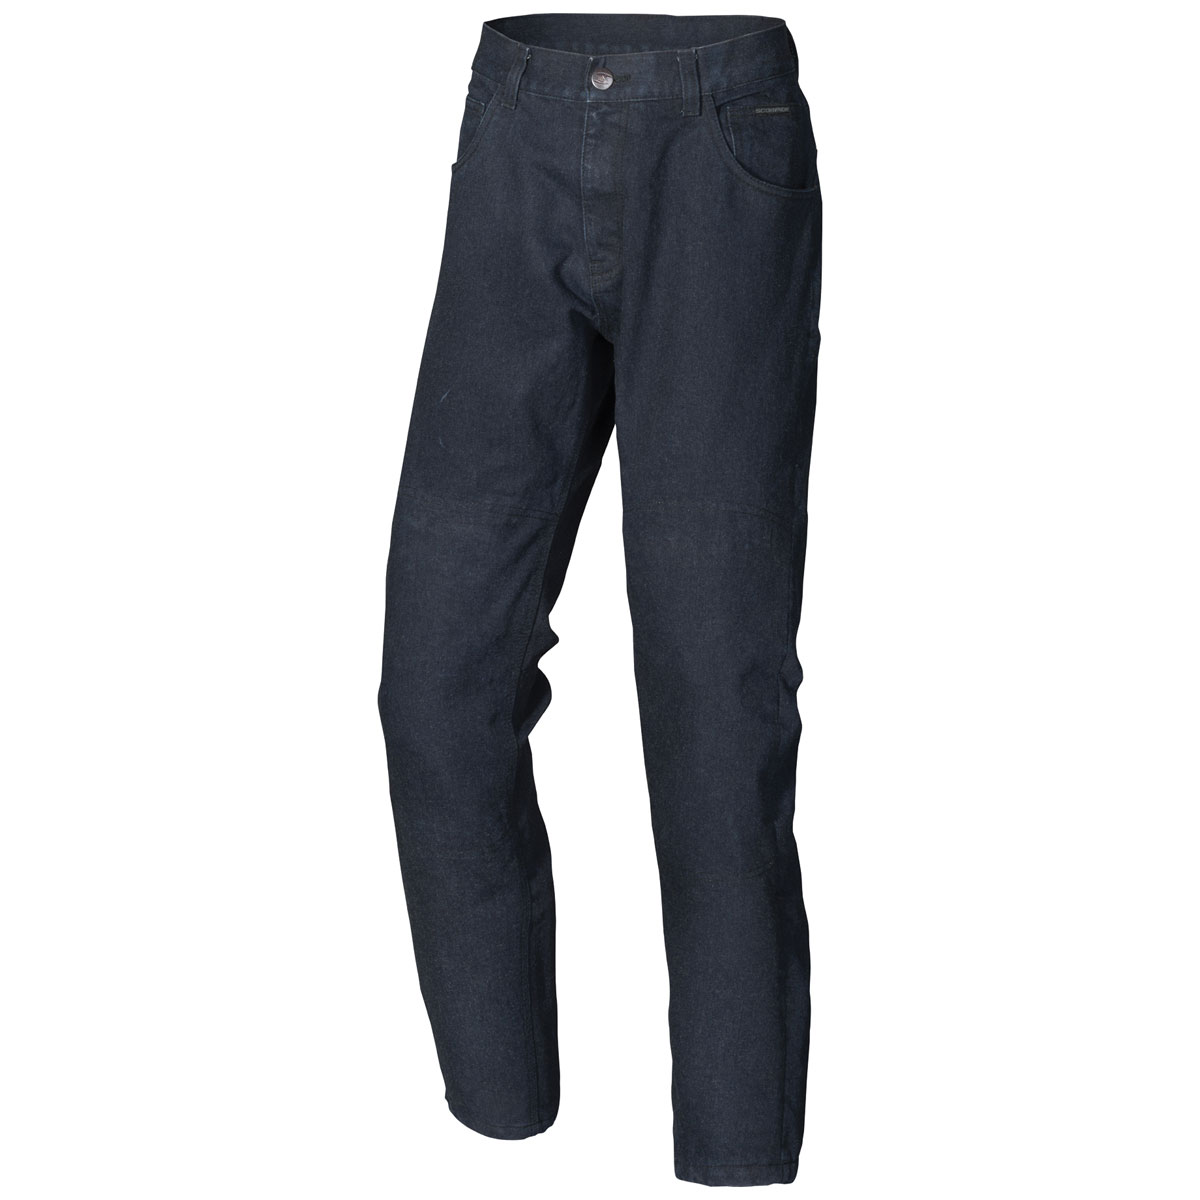 Scorpion EXO Men's Covert Ultra Blue Jeans